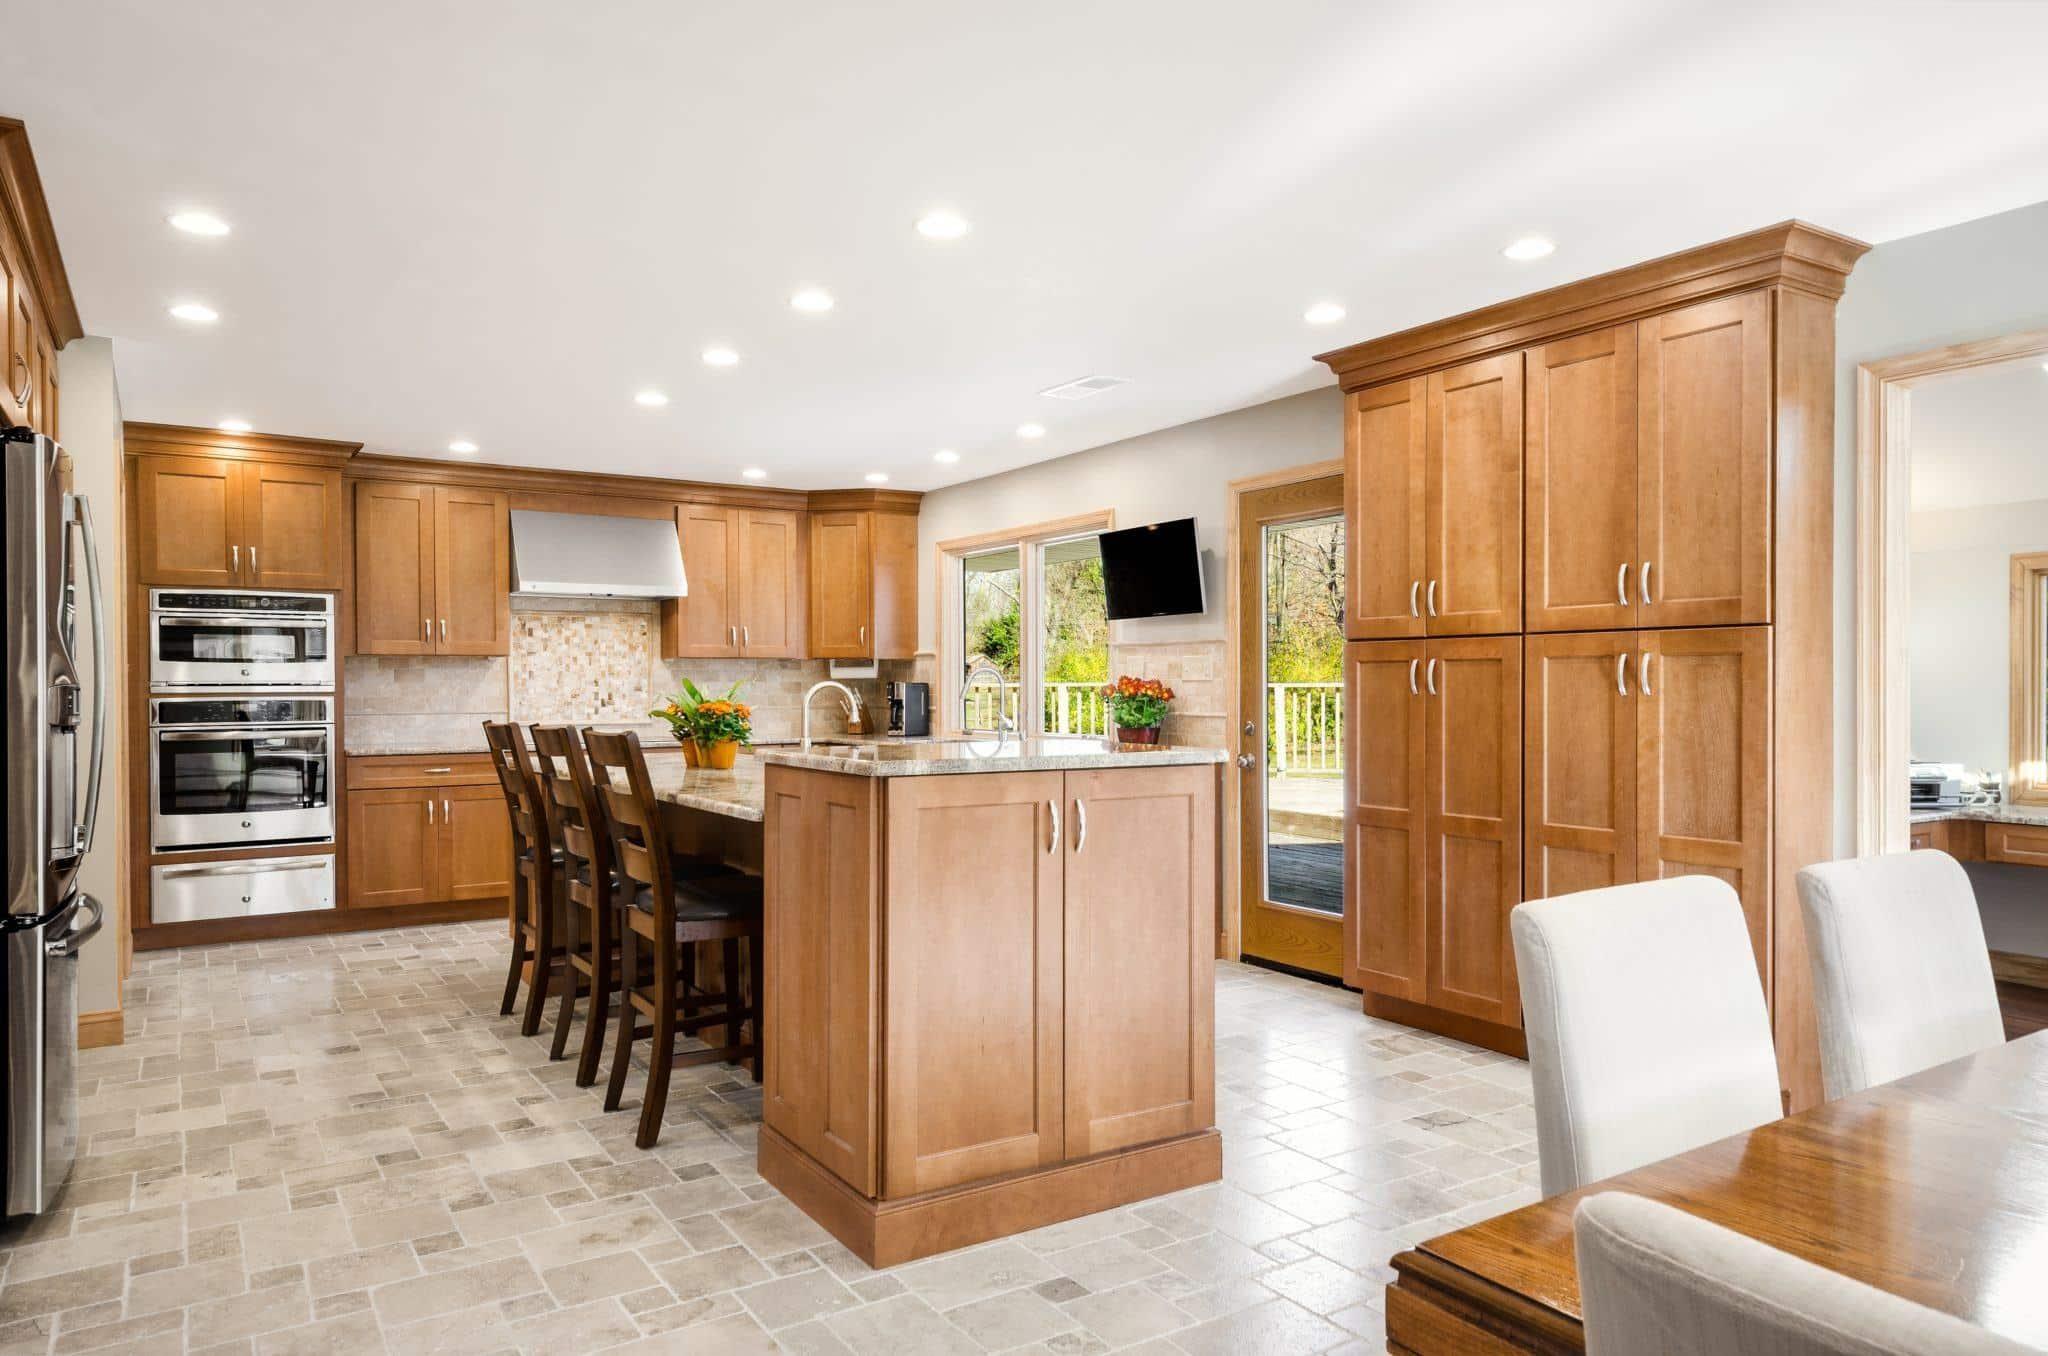 quality brand kitchen cabinets moen banbury faucet 2015 popular cabinetry comparison